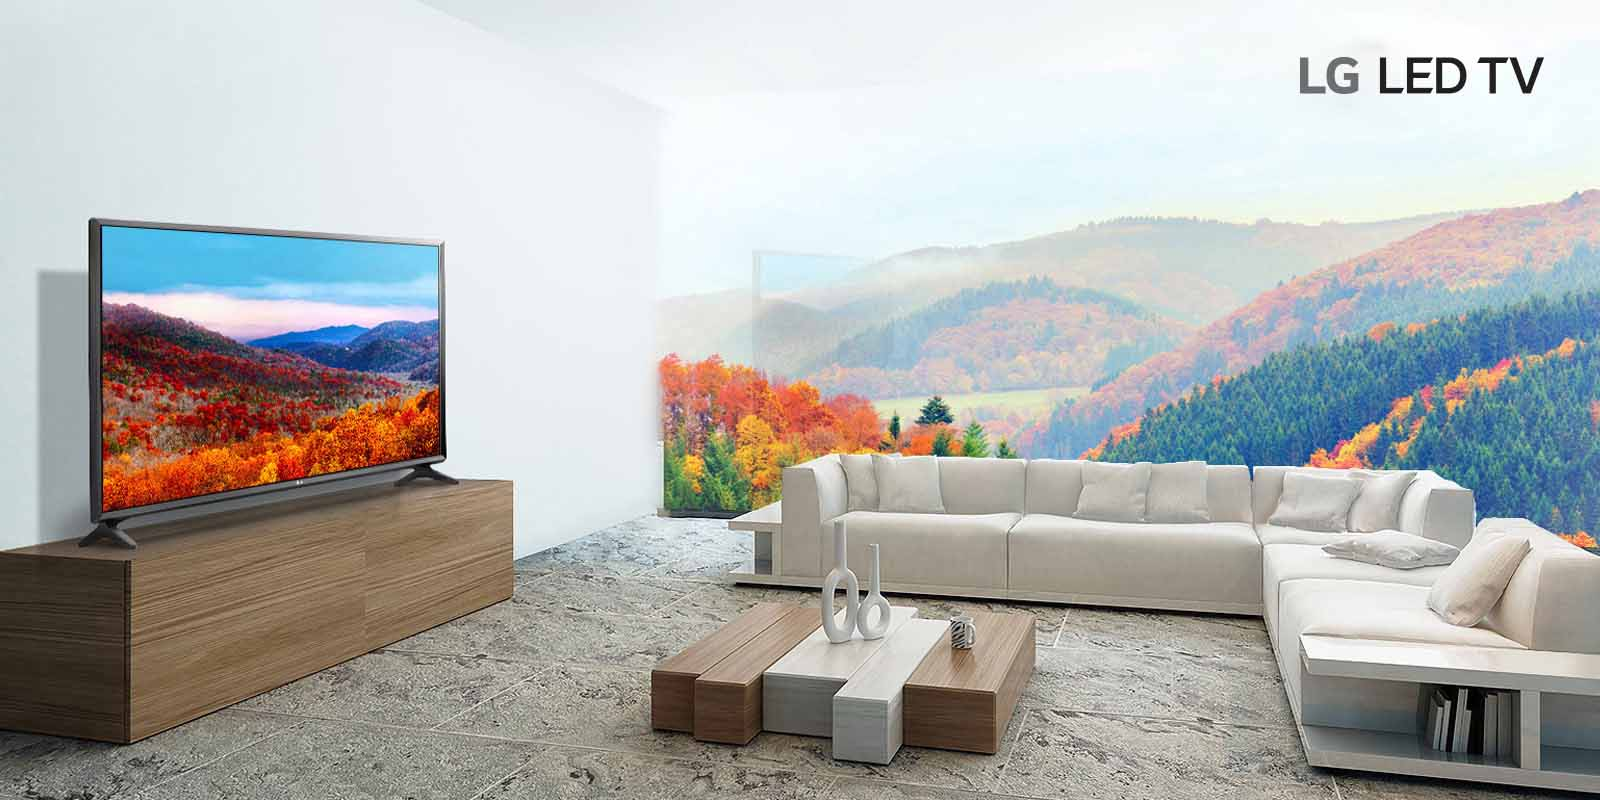 LG LED TV 1 1